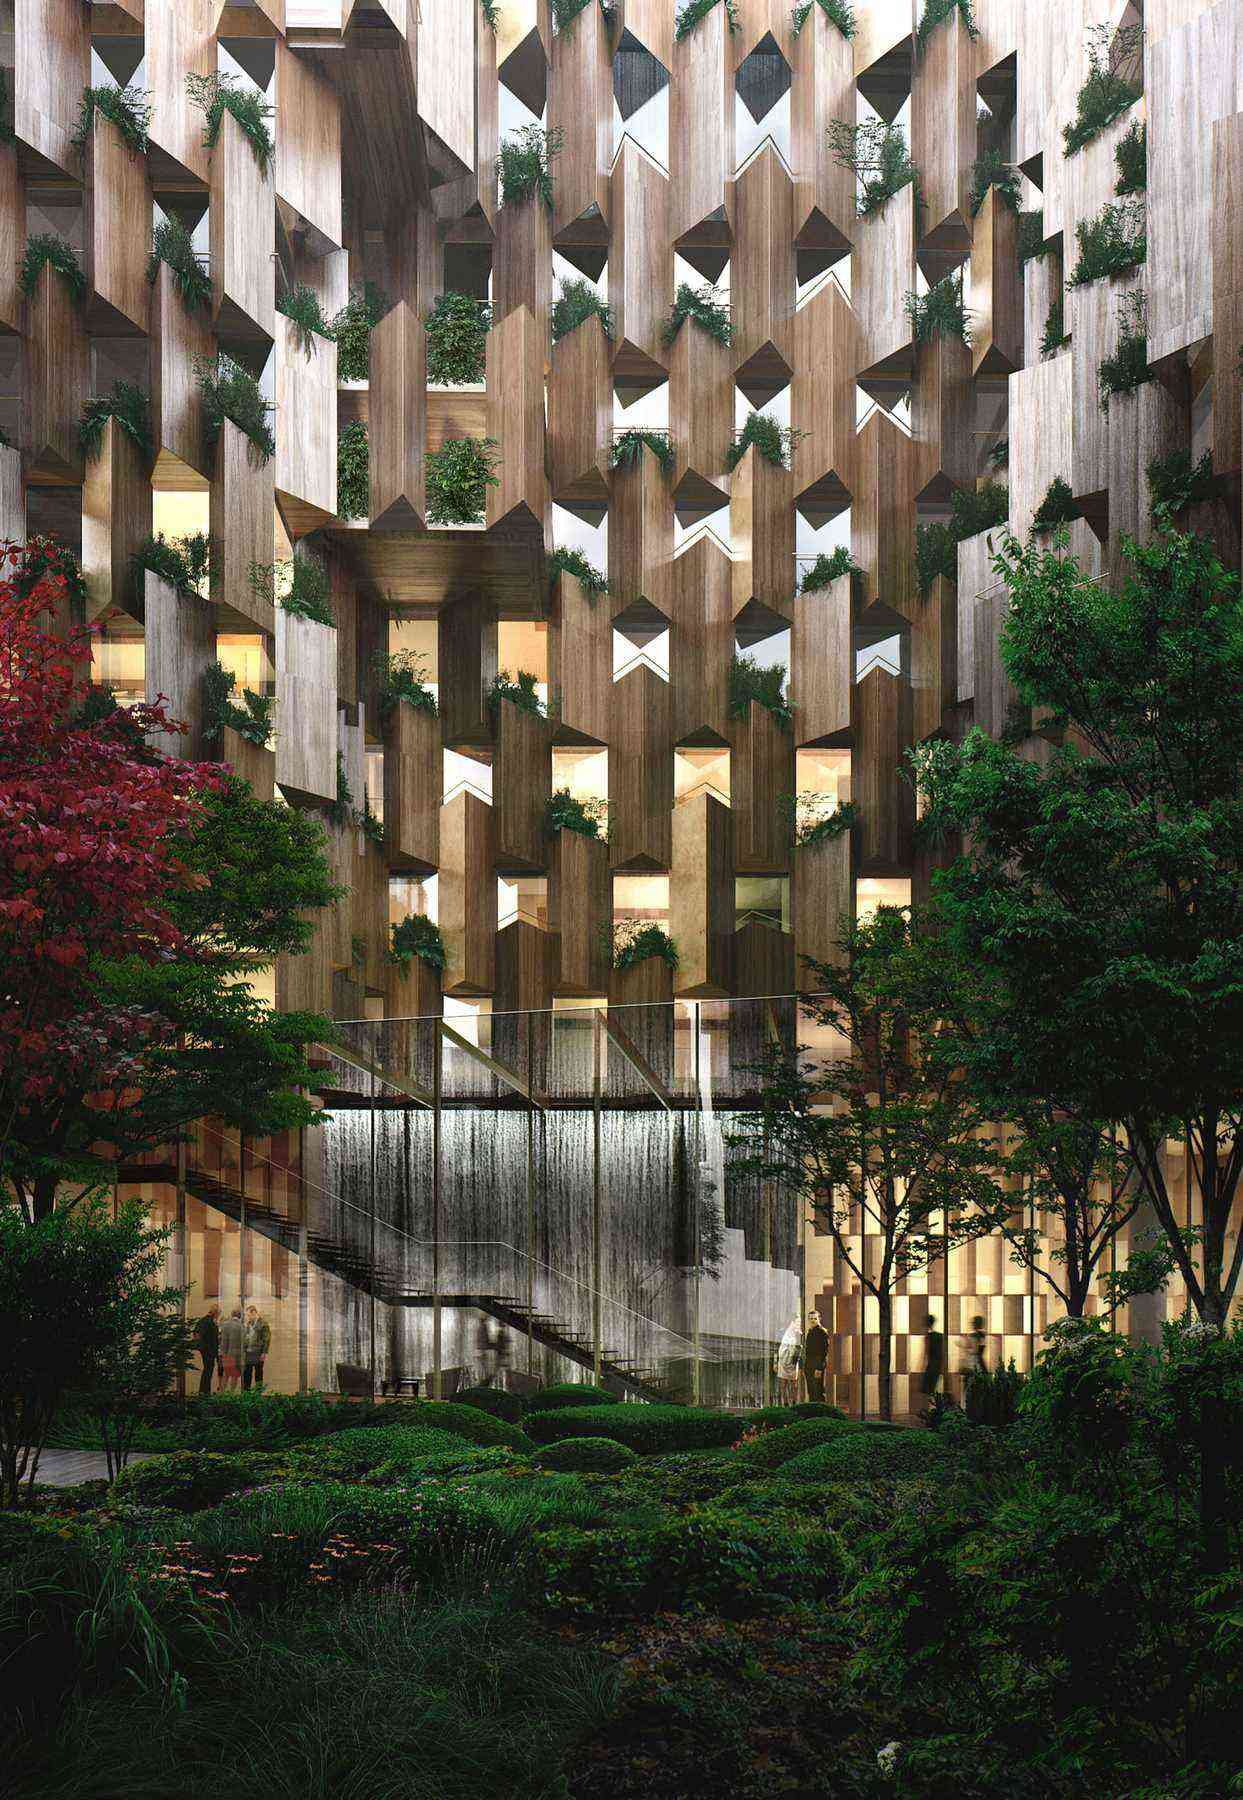 1-hotel-paris-kengo-kuma-associates-france-architecture-_dezeen_2364_col_12